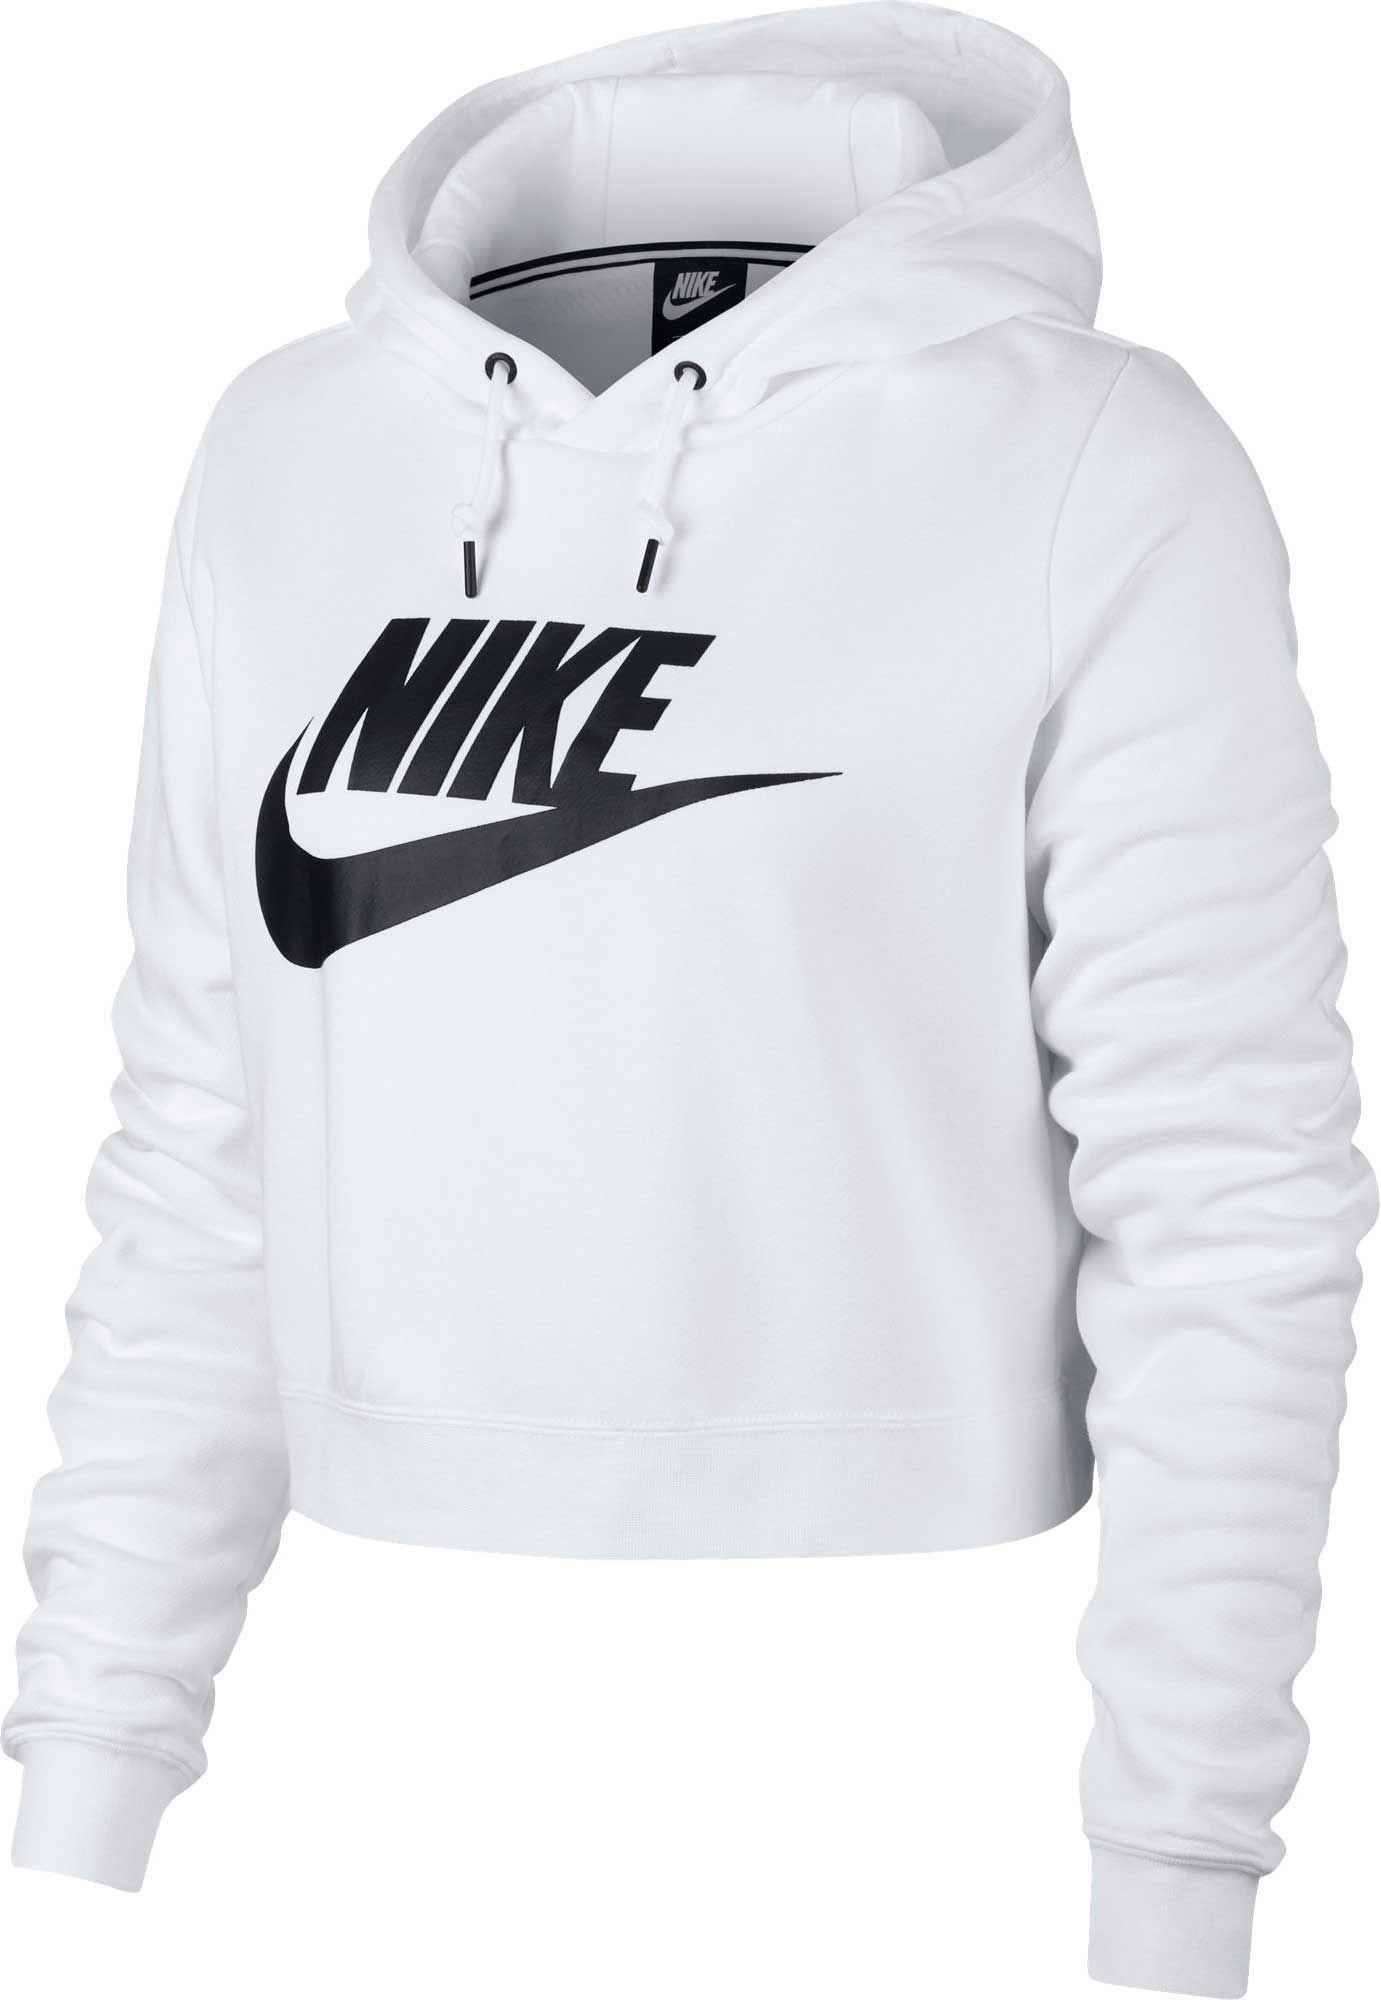 15514401bff7 Lyst - Nike Sportswear Rally Cropped Hoodie in White